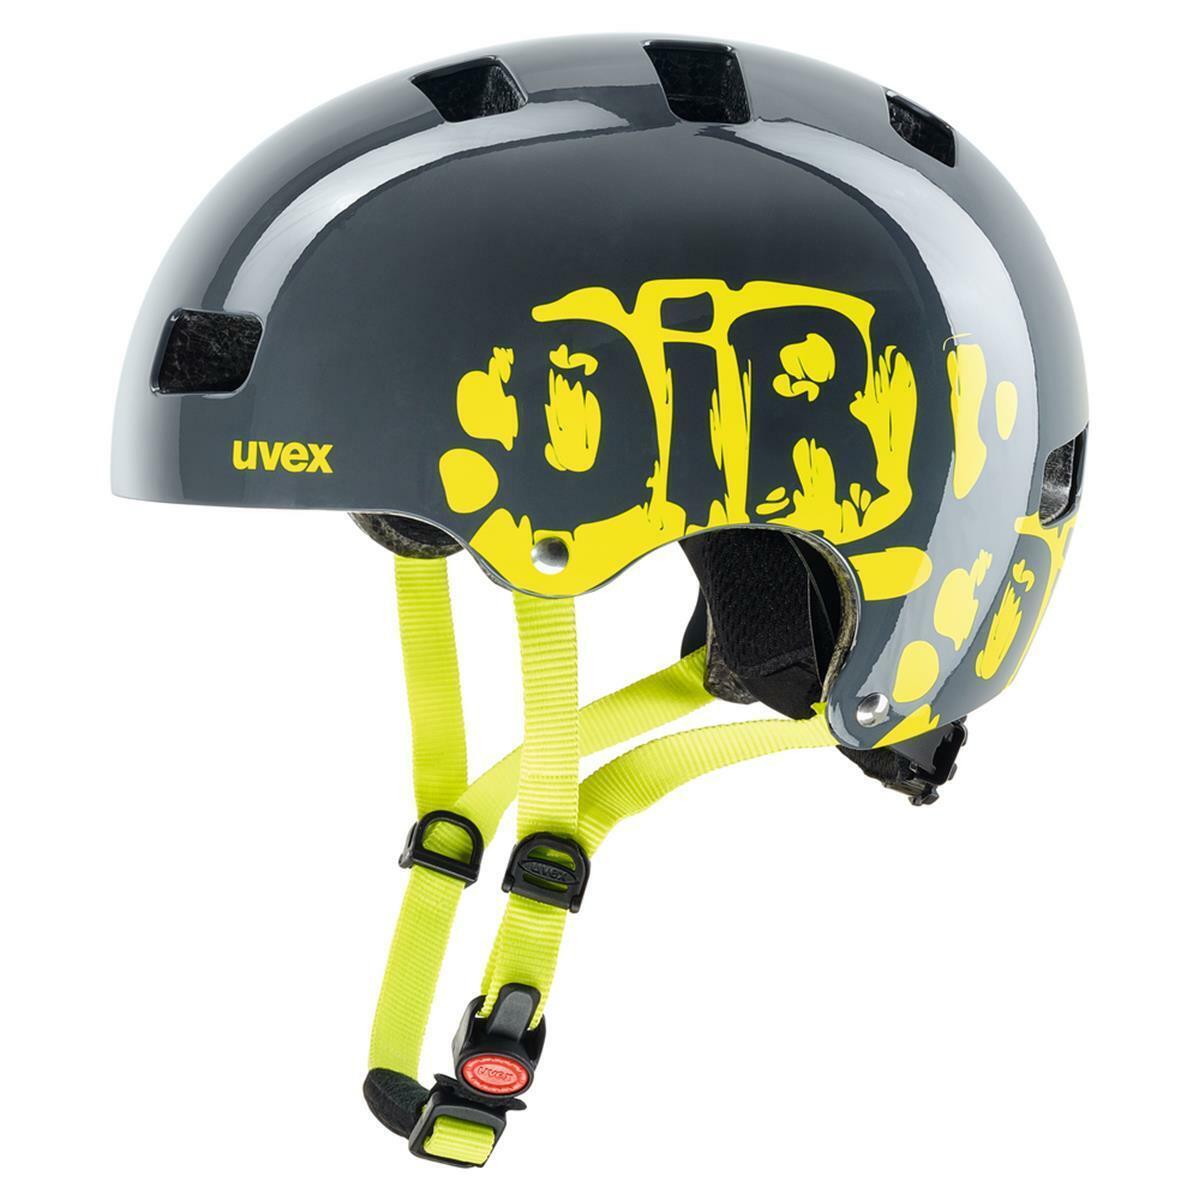 Uvex Kid 3, Dirt Bike Grigio Calce